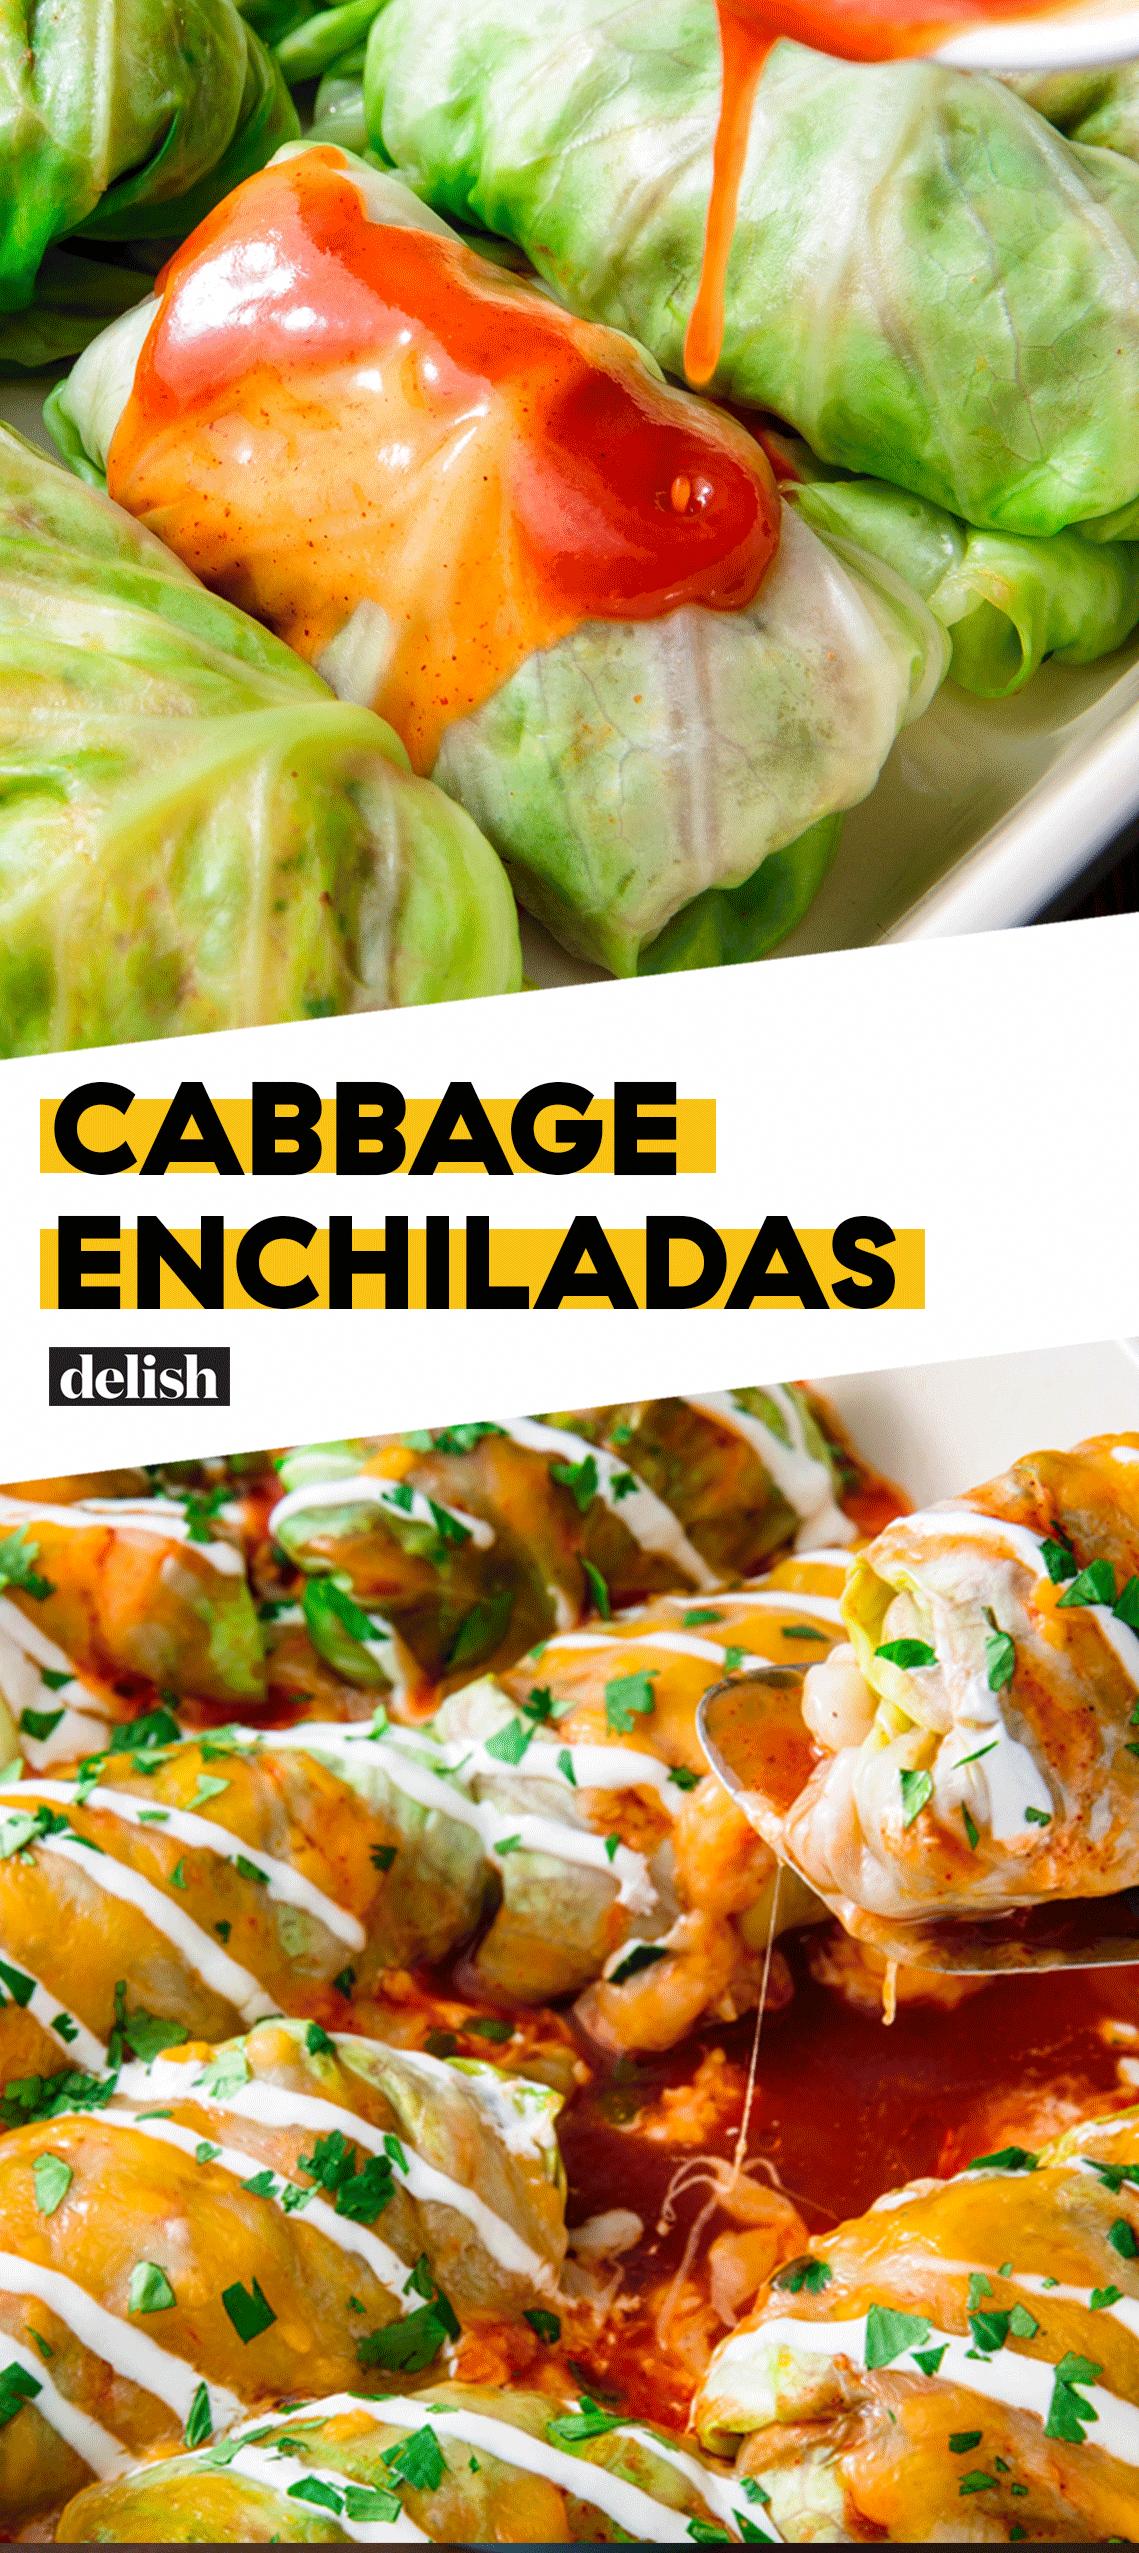 Low-Carb Cabbage Enchiladas | Recipe | Healthy recipes, No ...